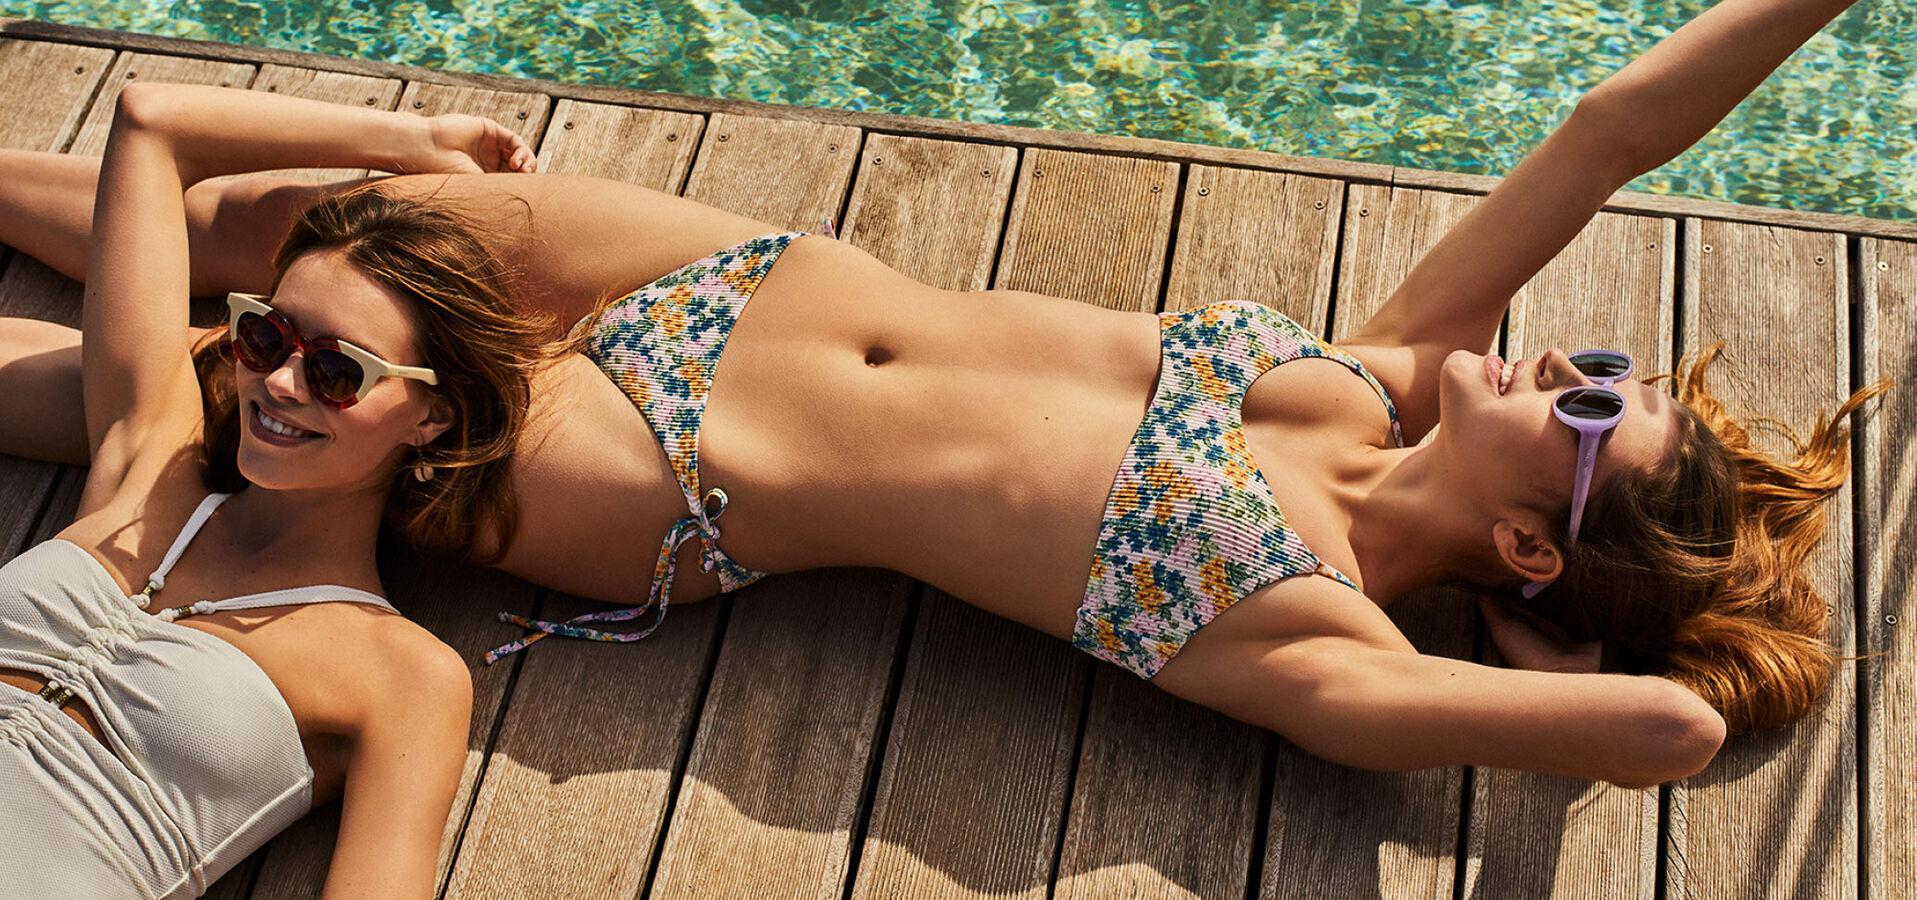 The perfect swimwear